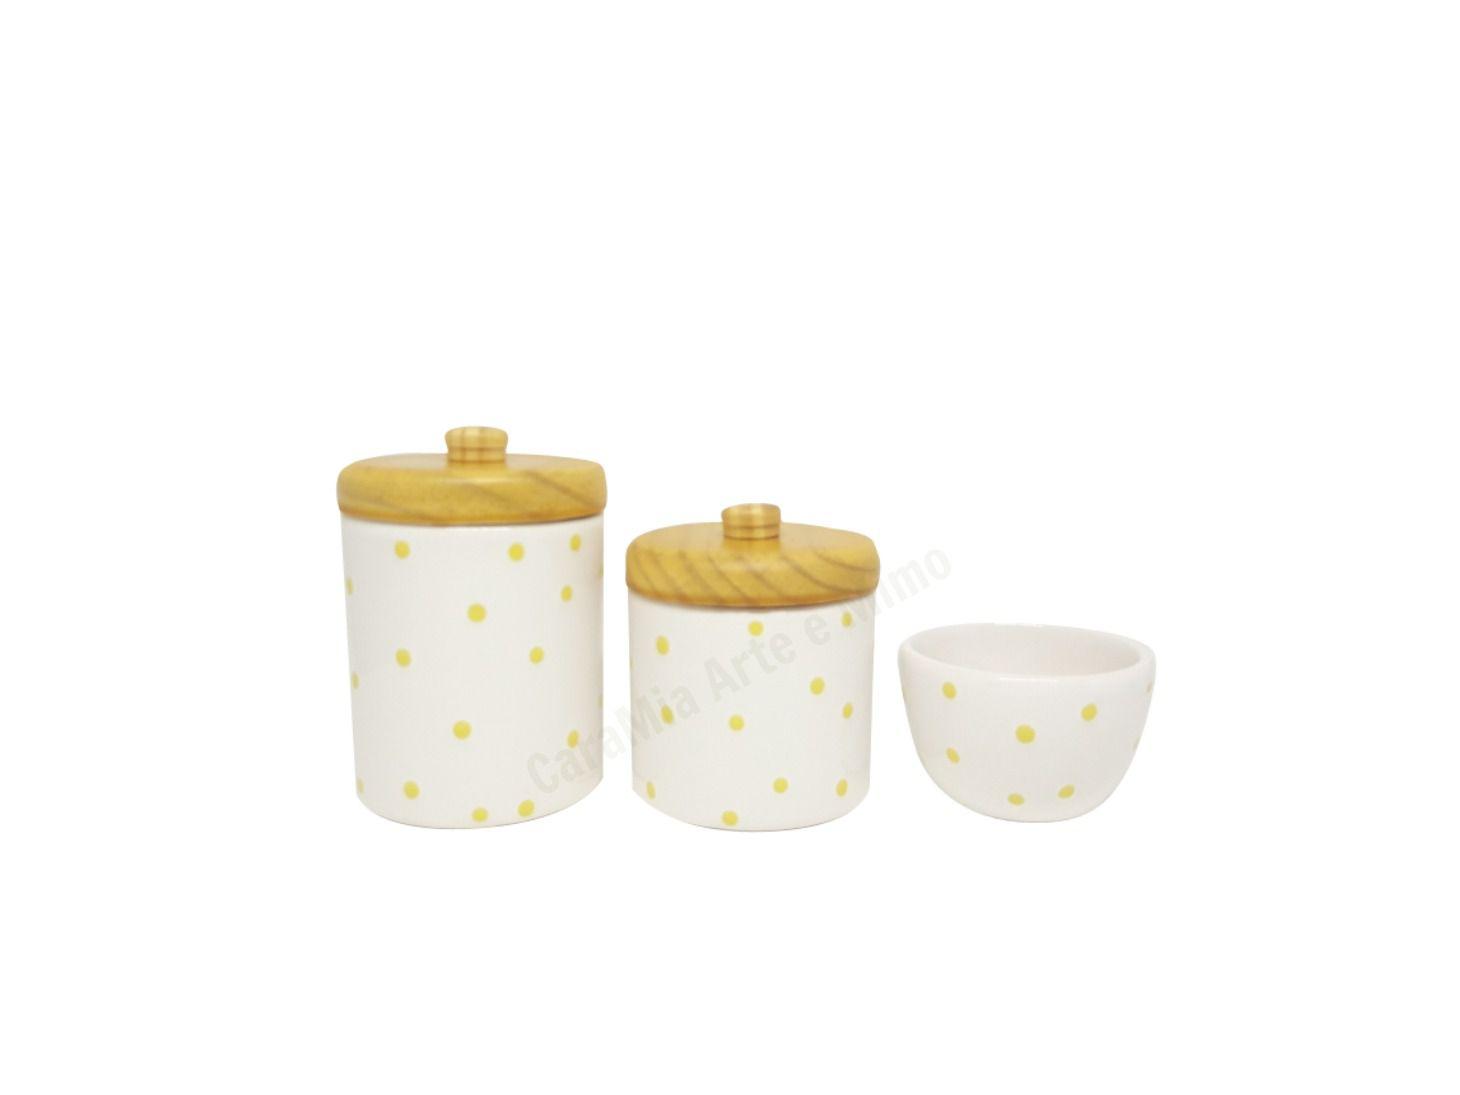 Kit Higiene Bebê Cerâmica Branco com Poá Amarelo |Tampas Pinus